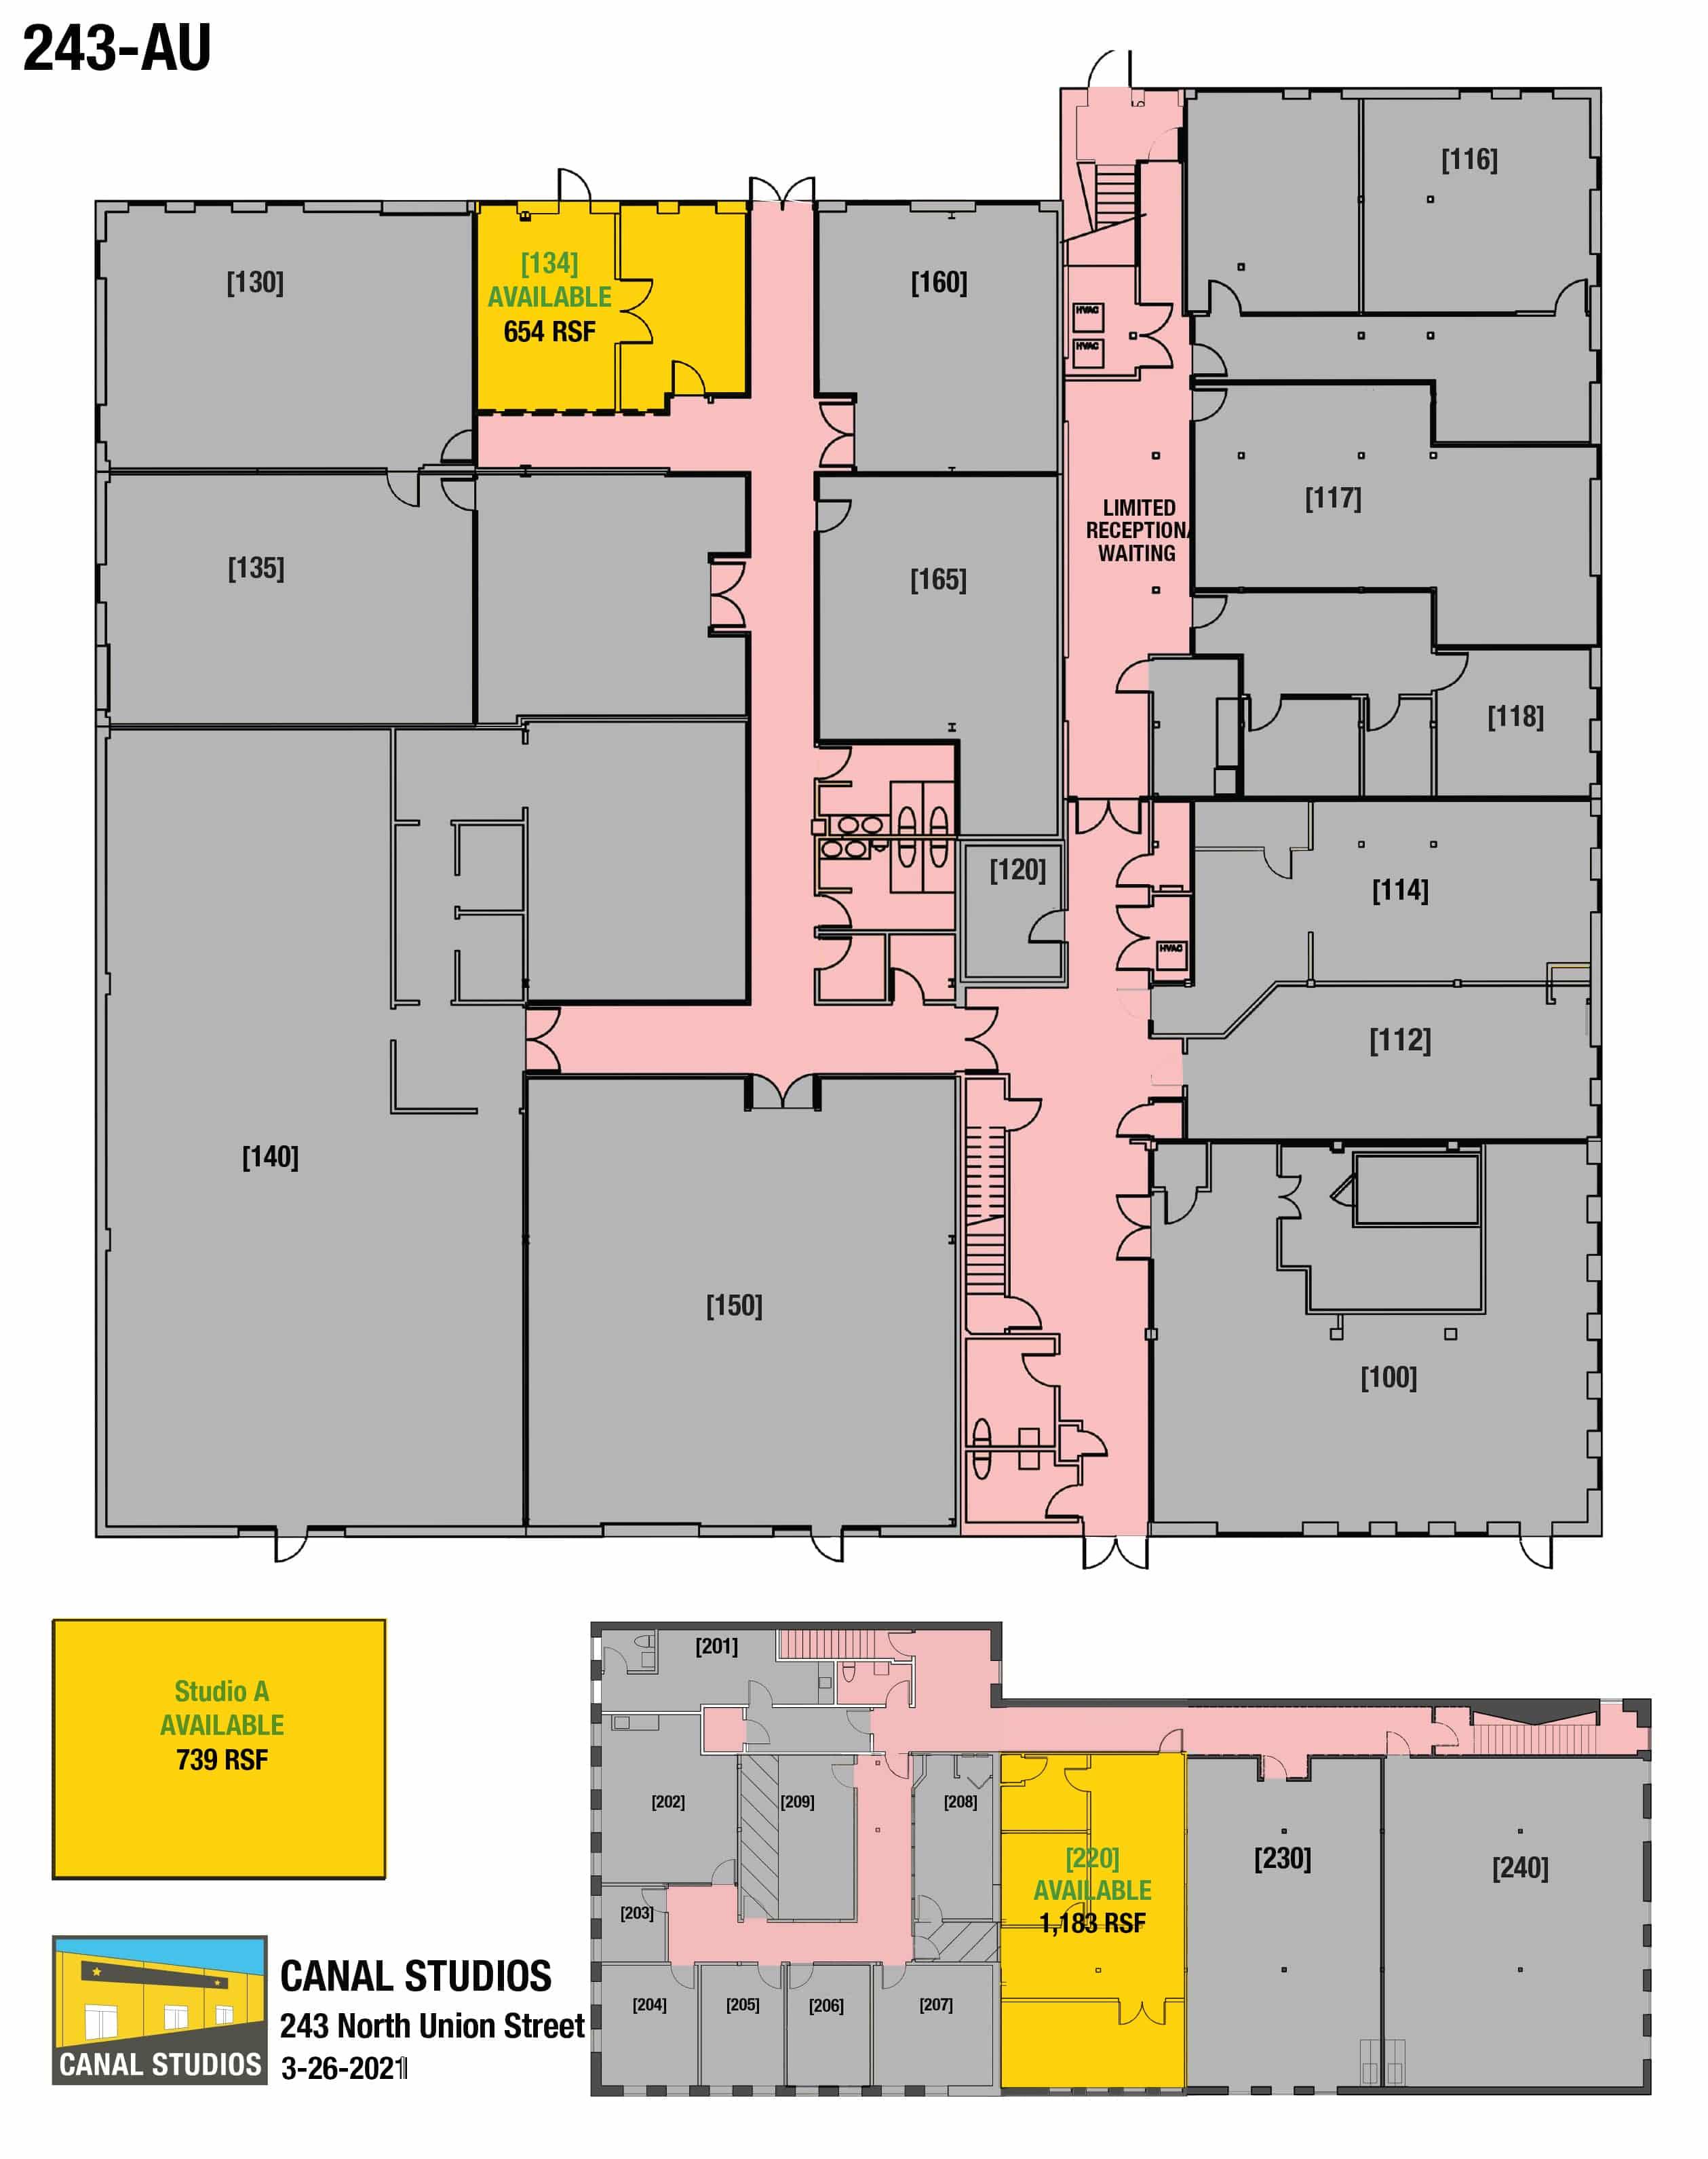 243 N. UNION STREET - Canal Rental Suites